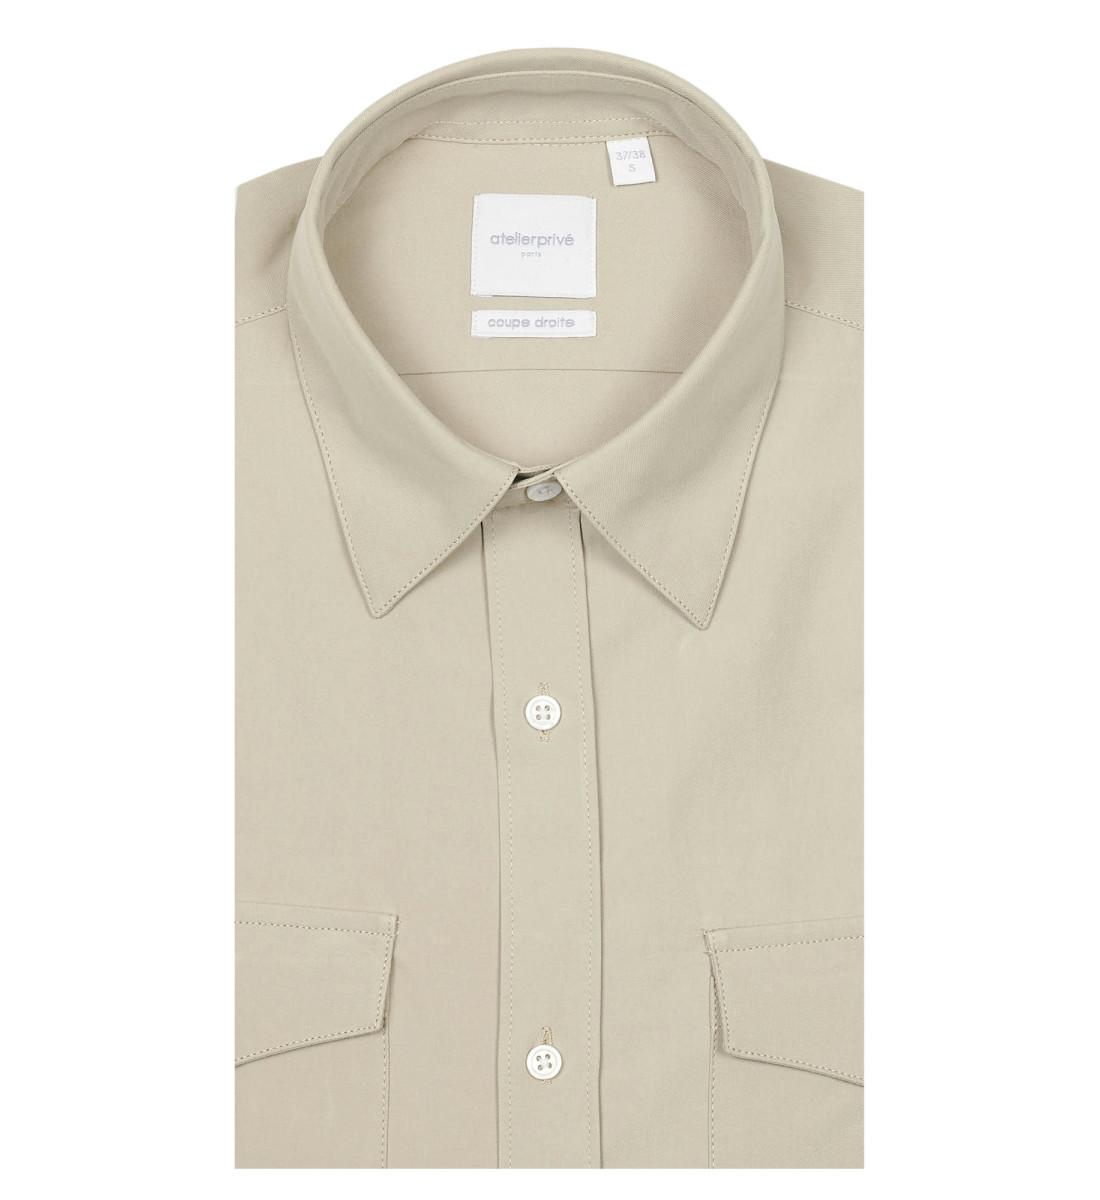 Chemise coupe droite ALDEN beige